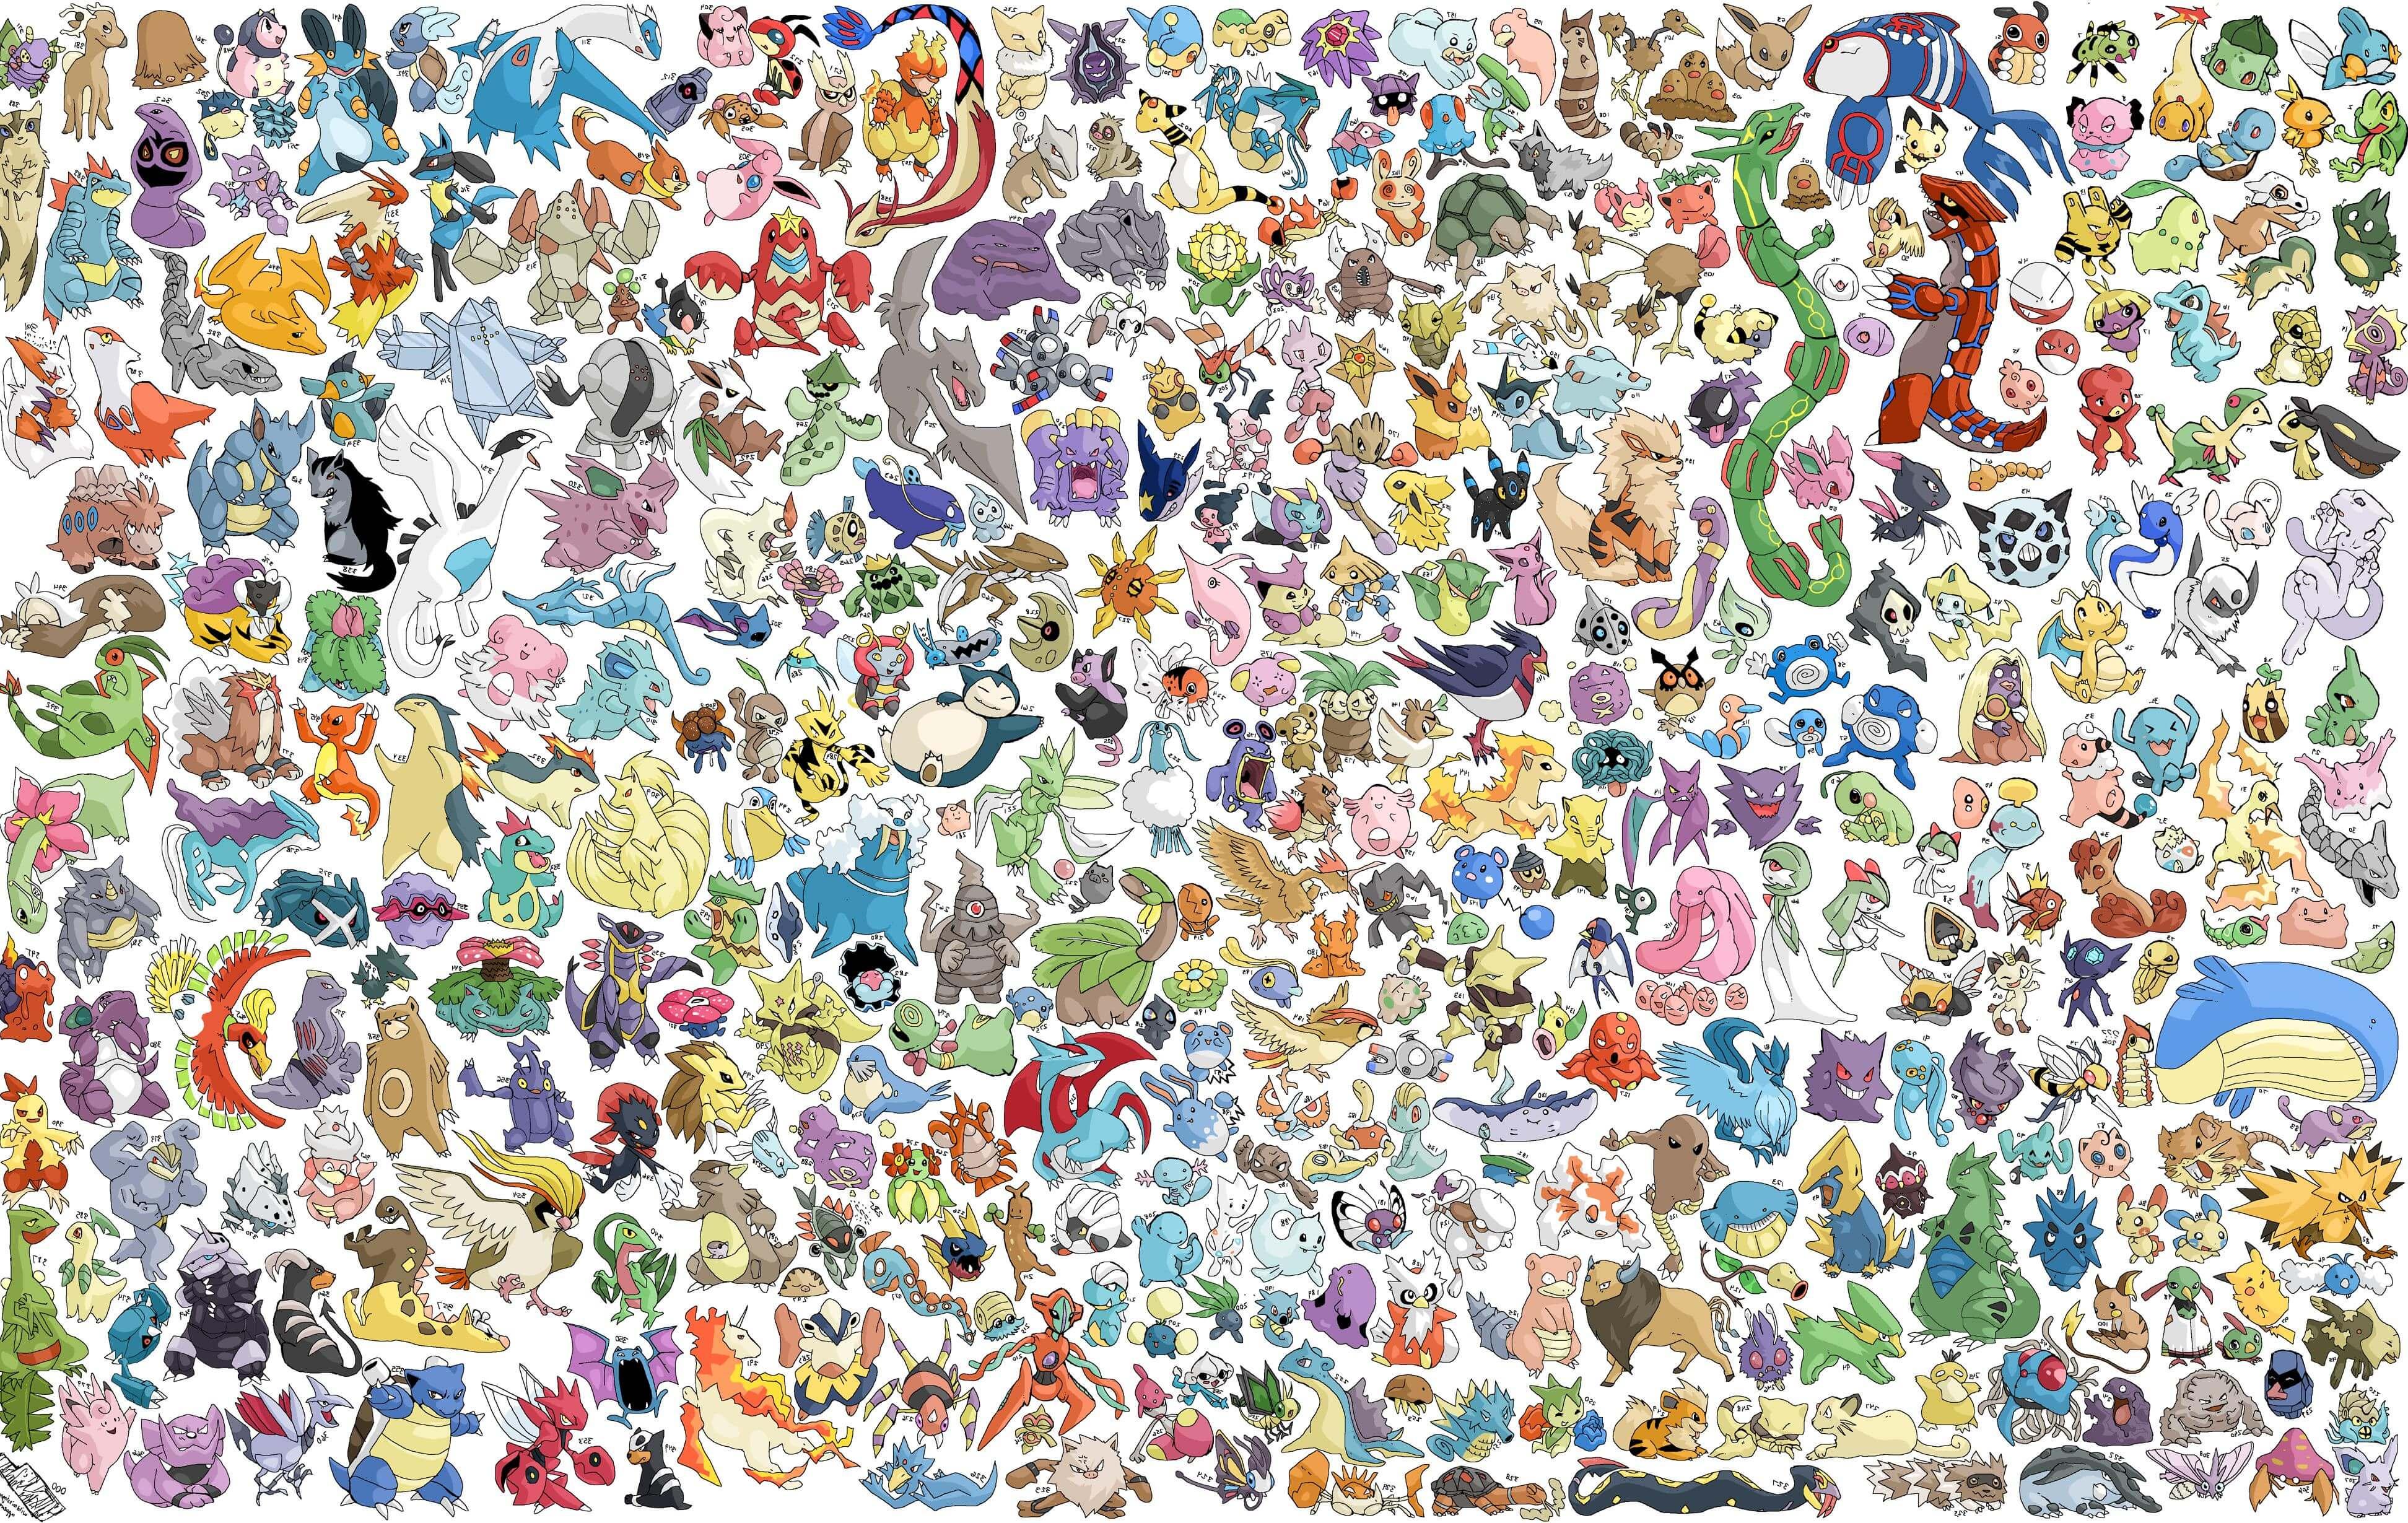 All Pokemon HD Wallpaper 3888x2459